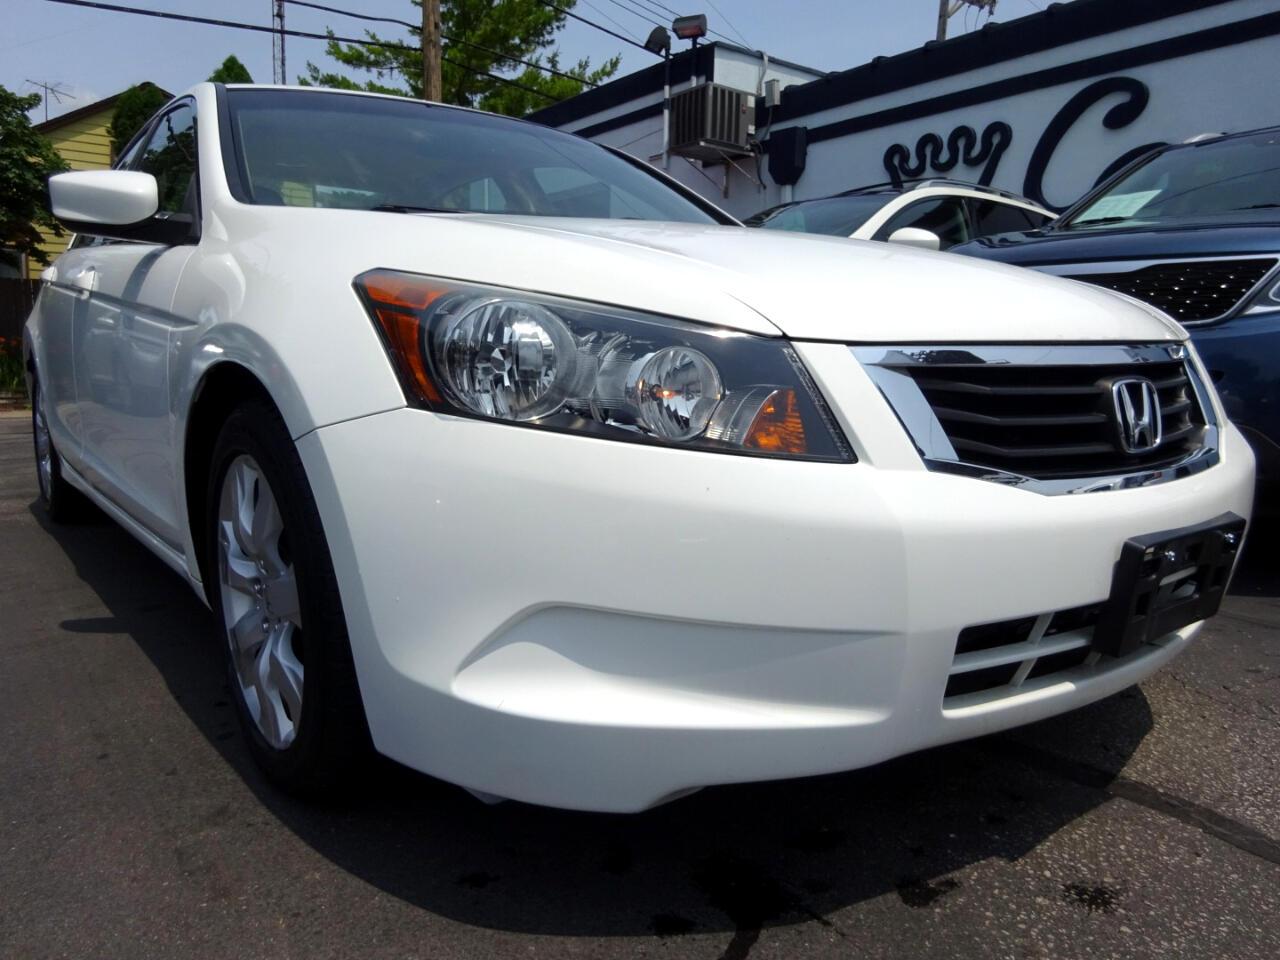 Honda Accord Sdn 4dr I4 Auto EX-L 2010